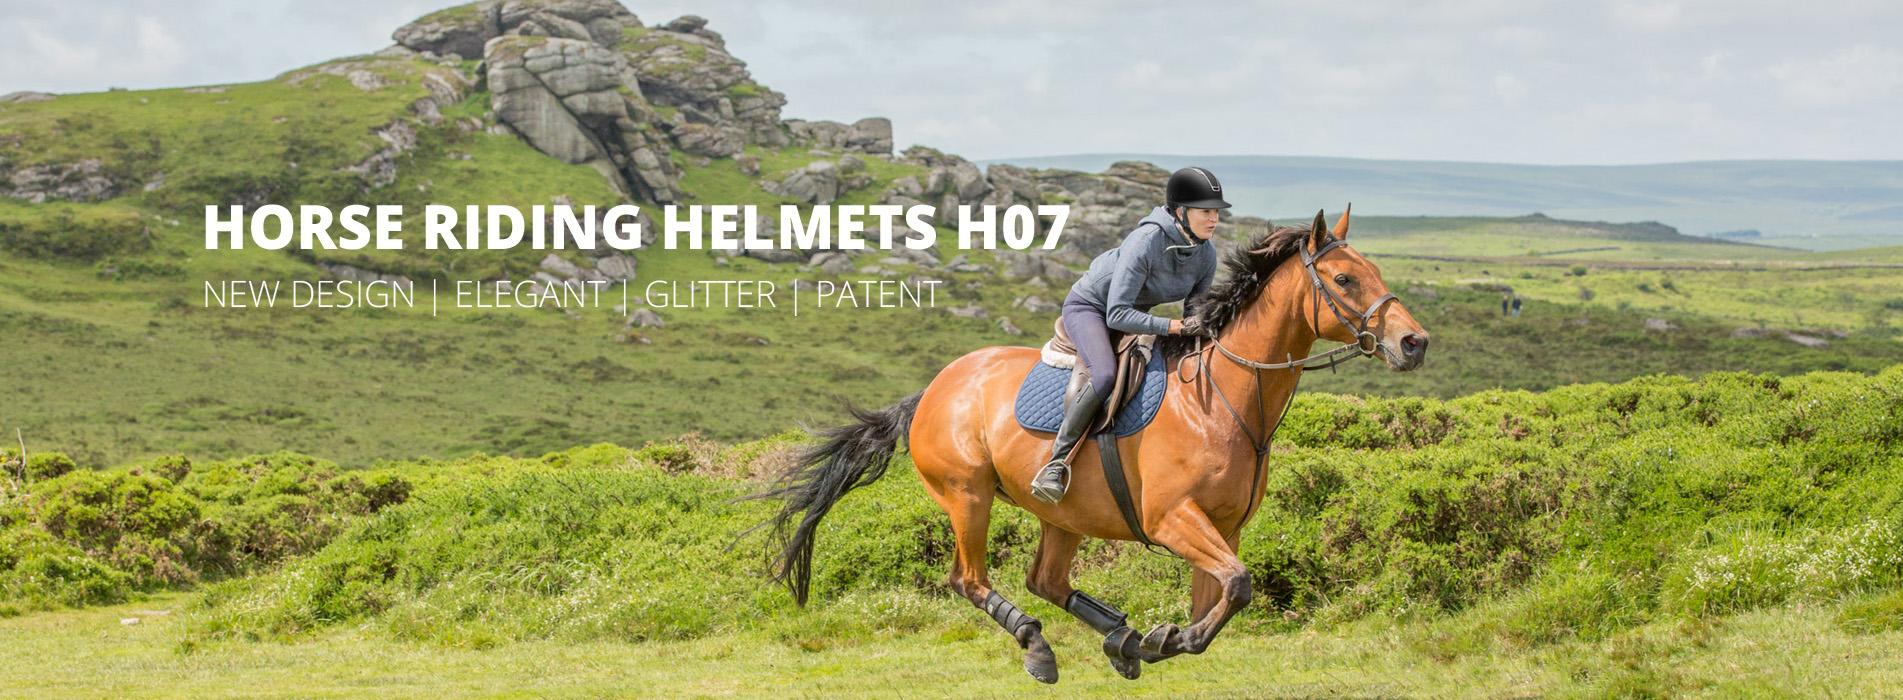 riding helmets h07 banner